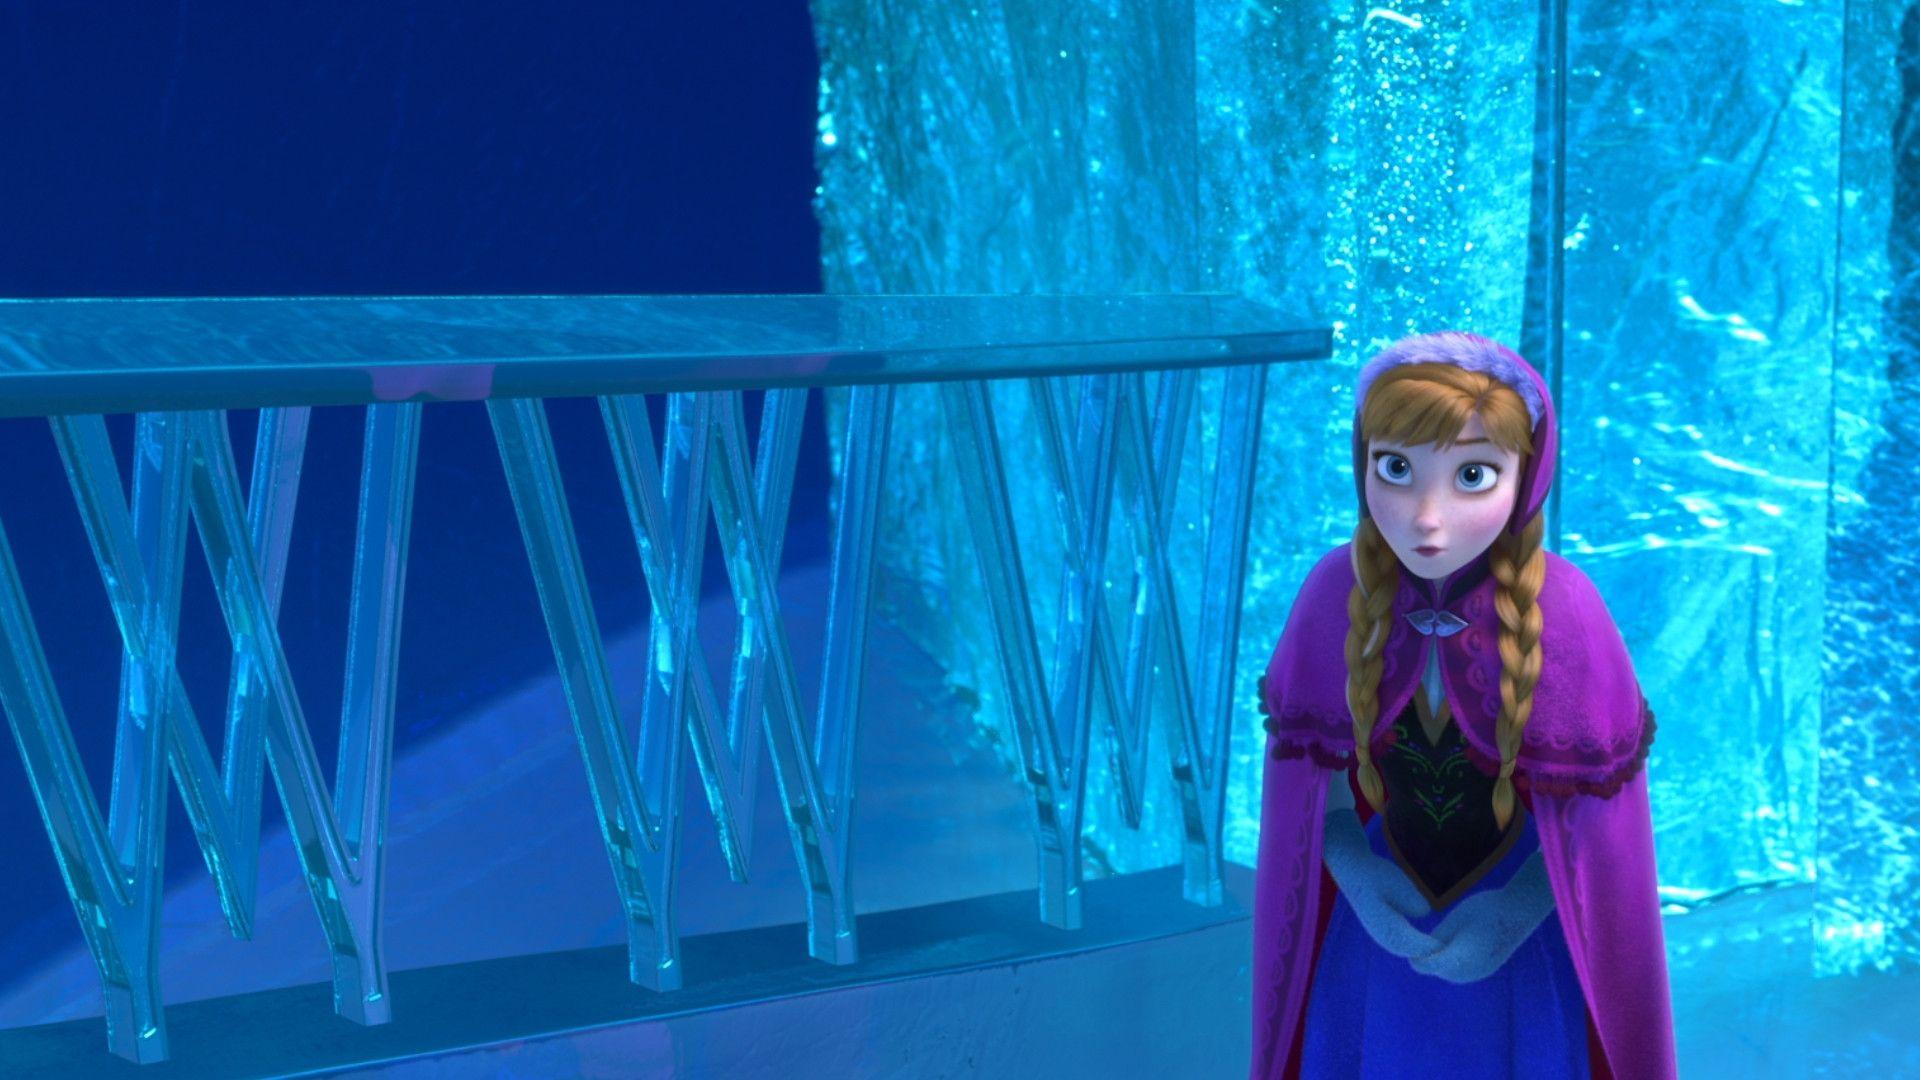 Elsa Anna Olaf Kristoff Hans Frozen Disney Wallpaper